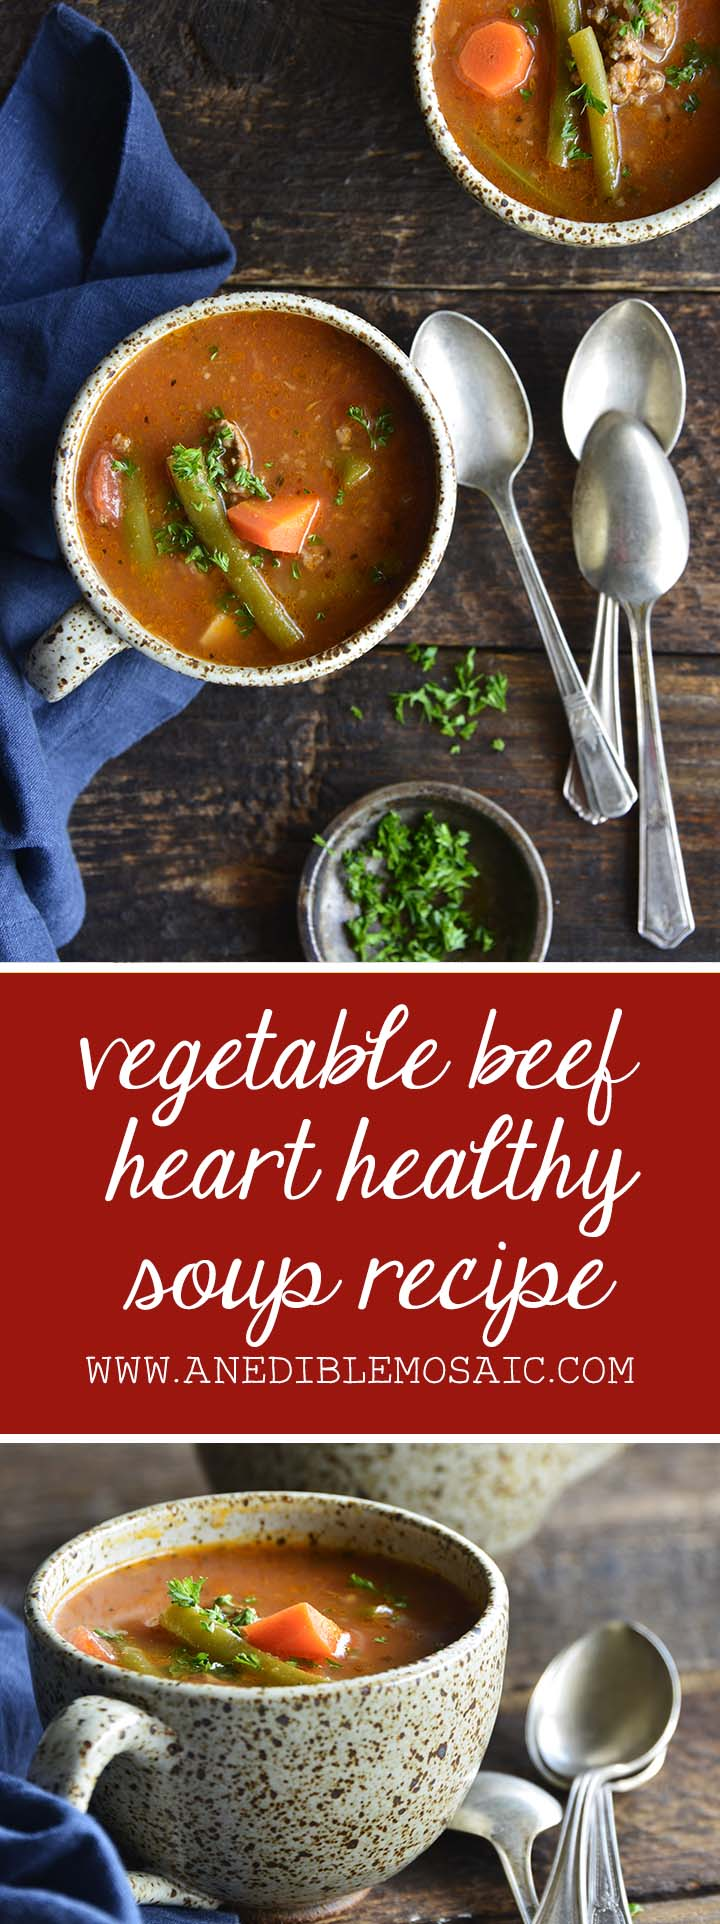 HEART HEALTHY SOUP RECIPE